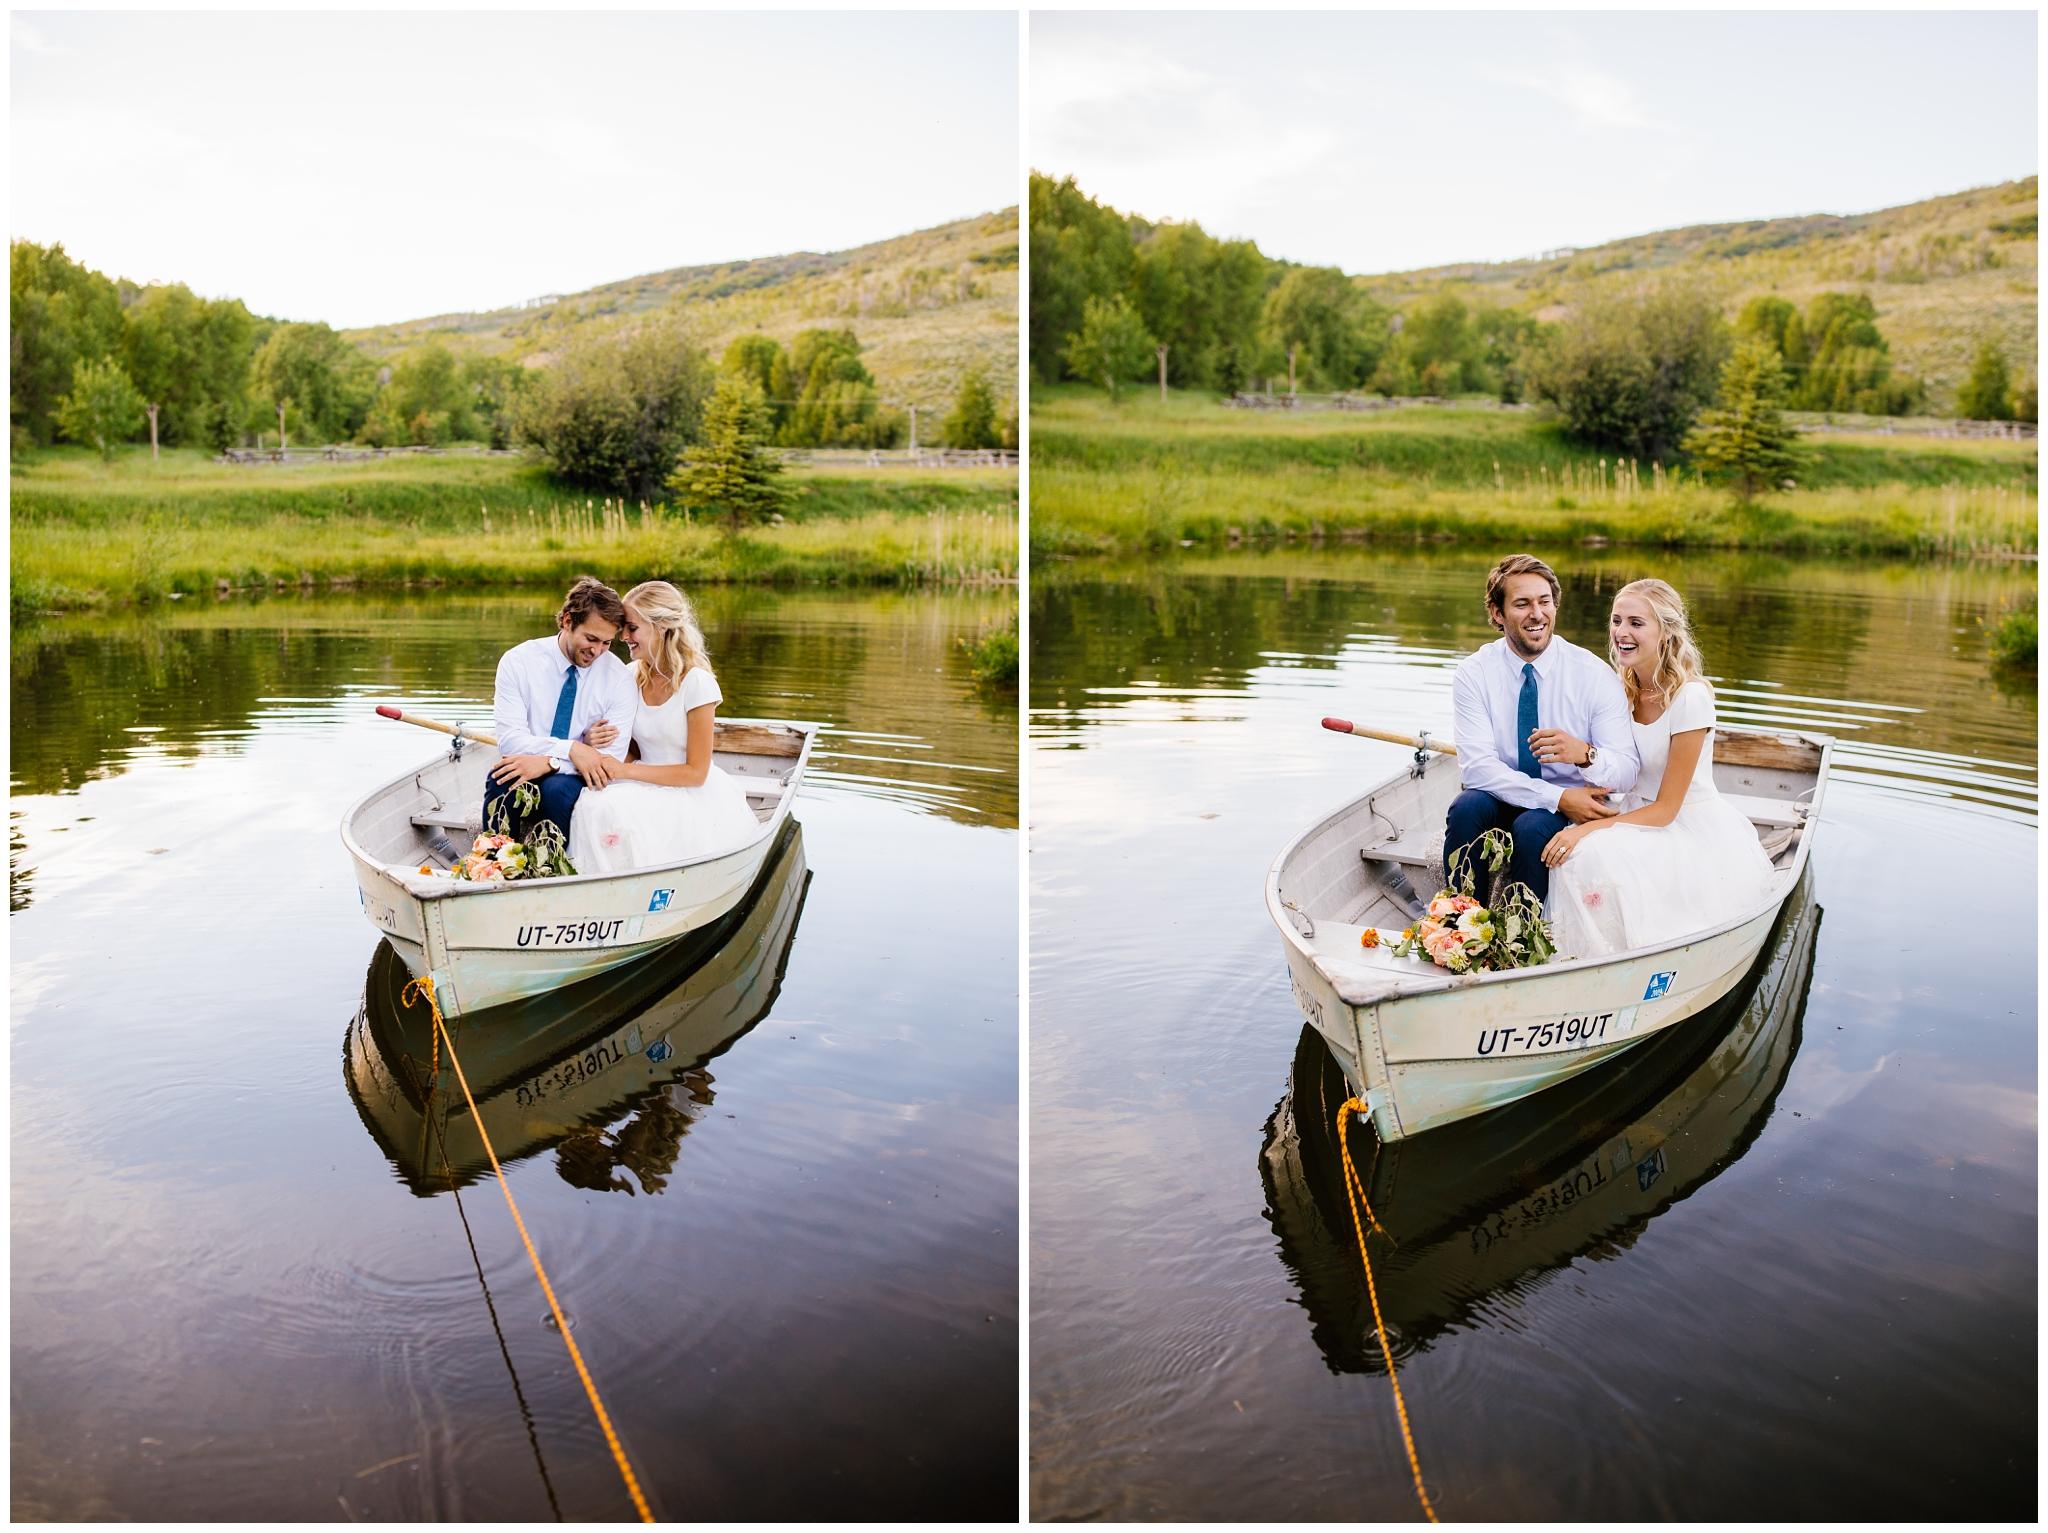 Lizzie-B-Imagery-Utah-Wedding-Photographer-Park-City-Photographer_0044.jpg